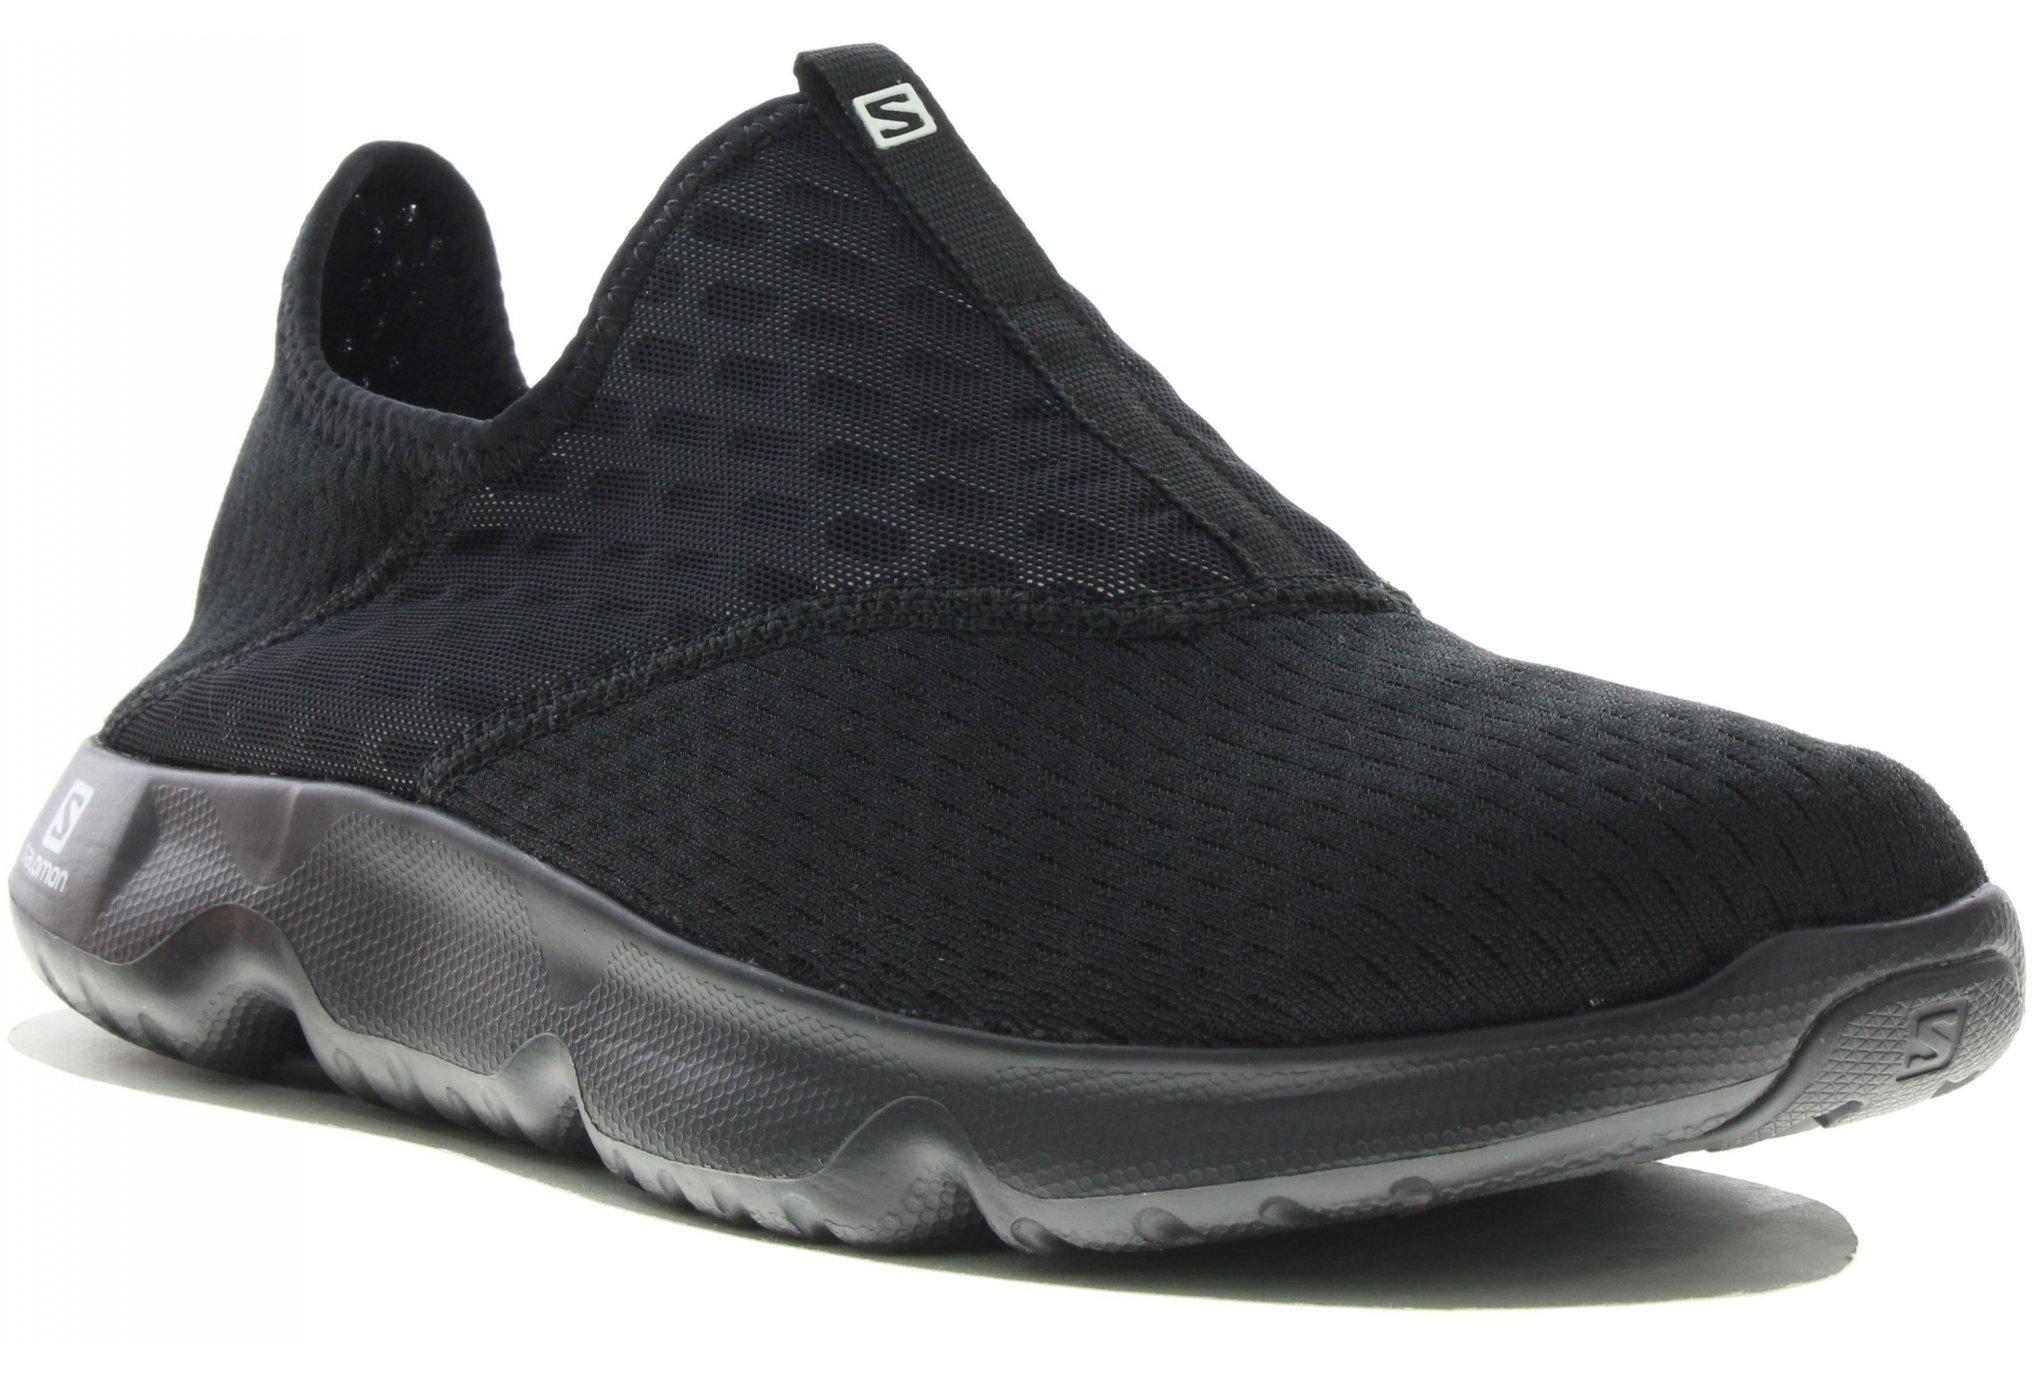 Salomon Reelax Moc 5.0 M Chaussures homme